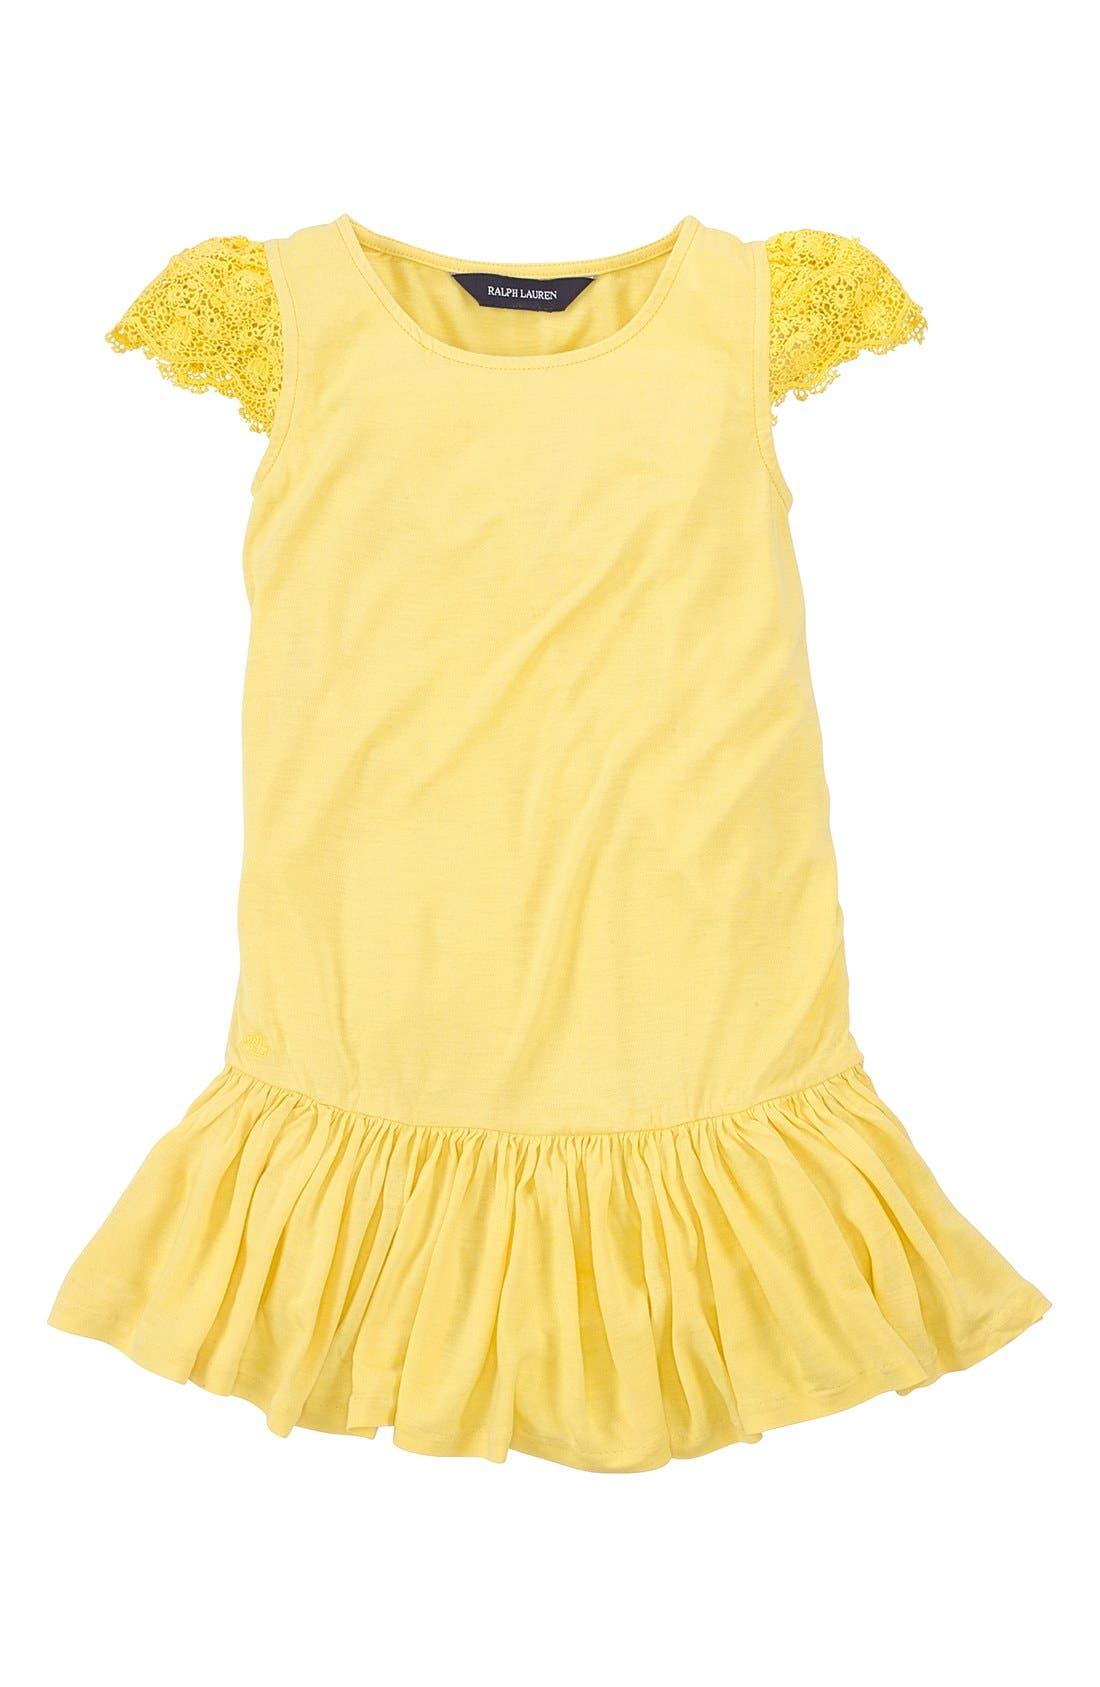 Alternate Image 1 Selected - Ralph Lauren Lace Sleeve Dress (Toddler Girls)